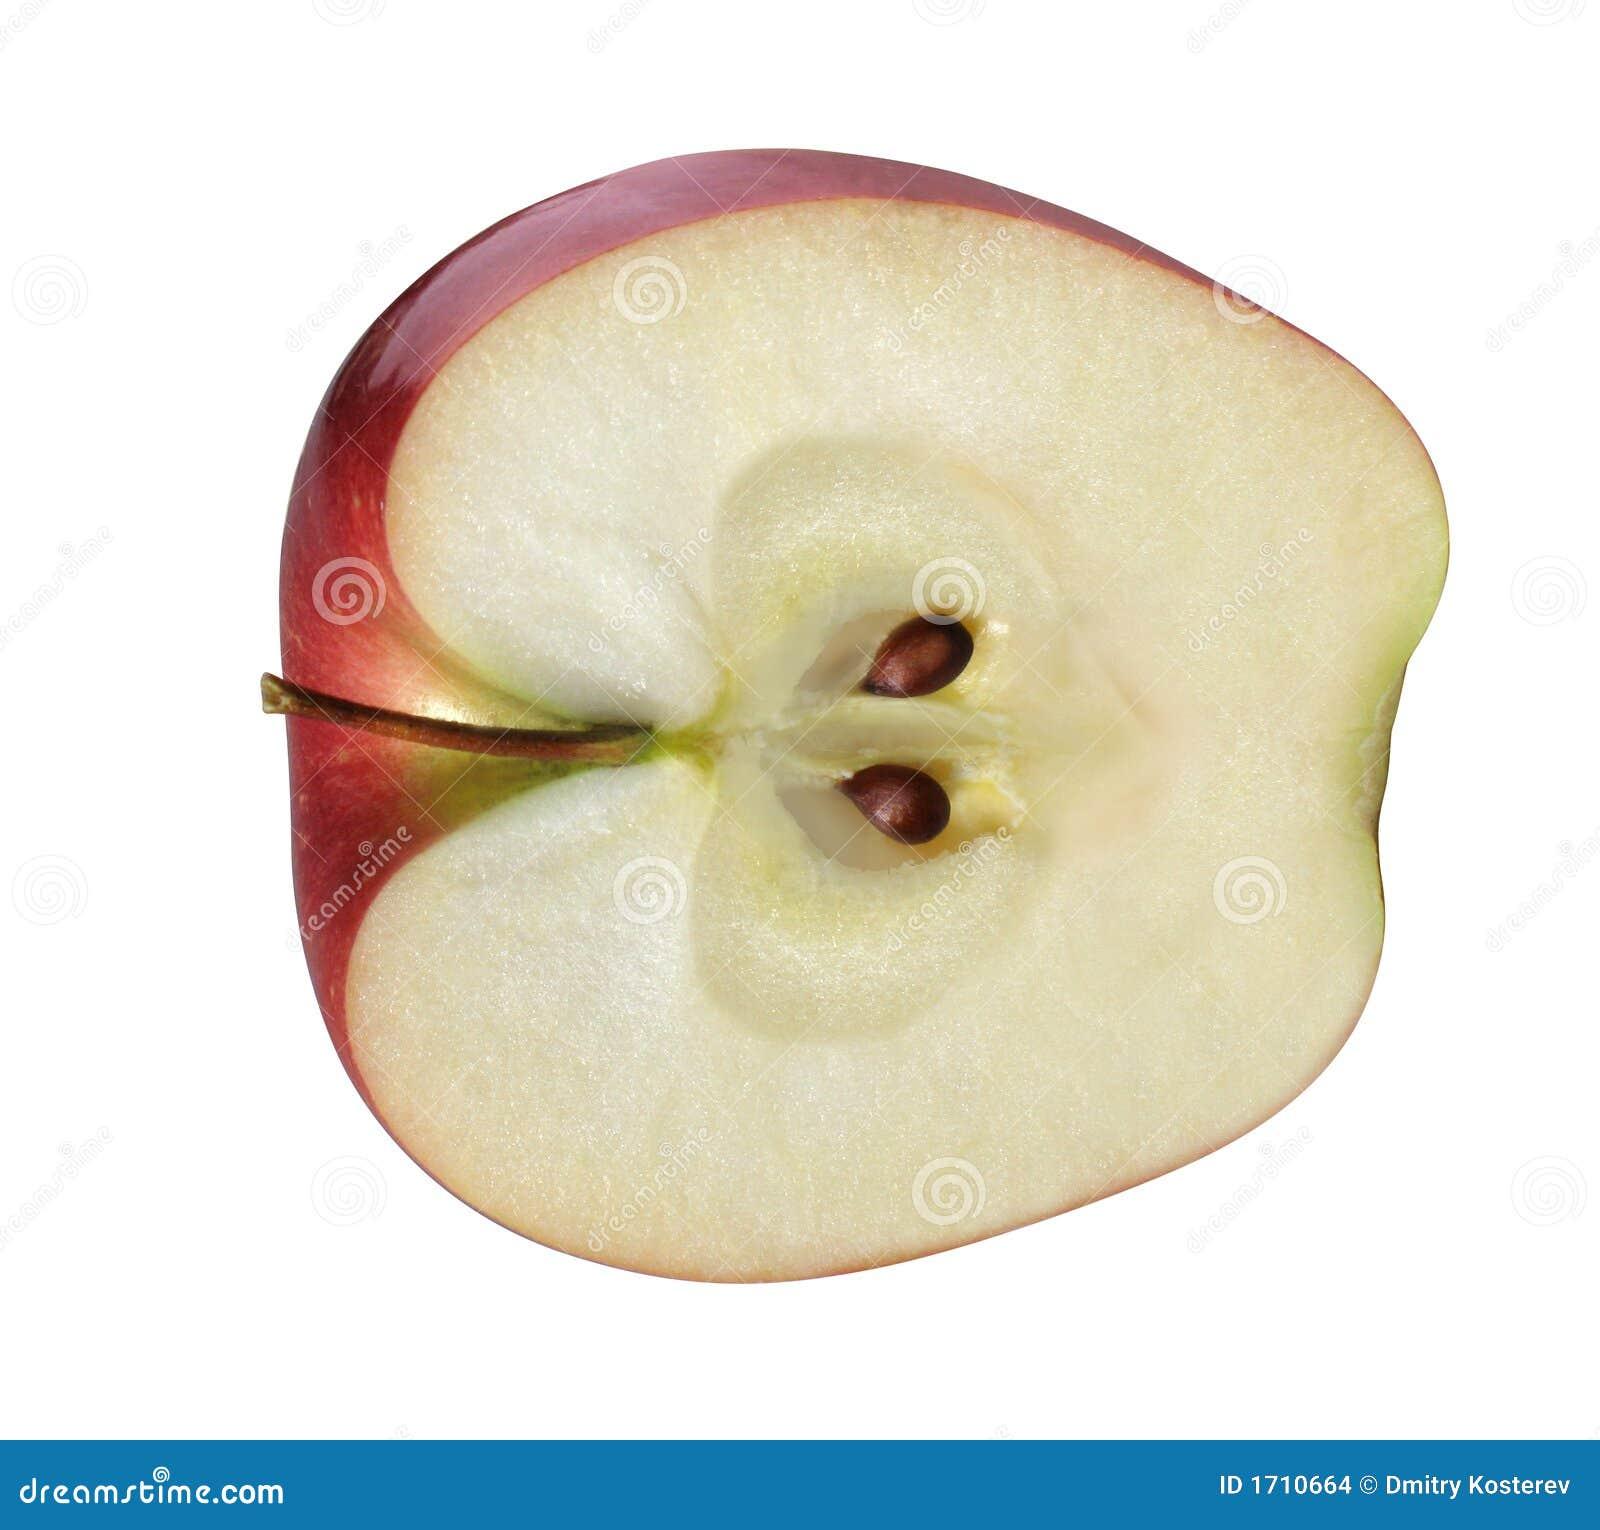 Http Www Dreamstime Com Stock Images Apple Half Image1710664